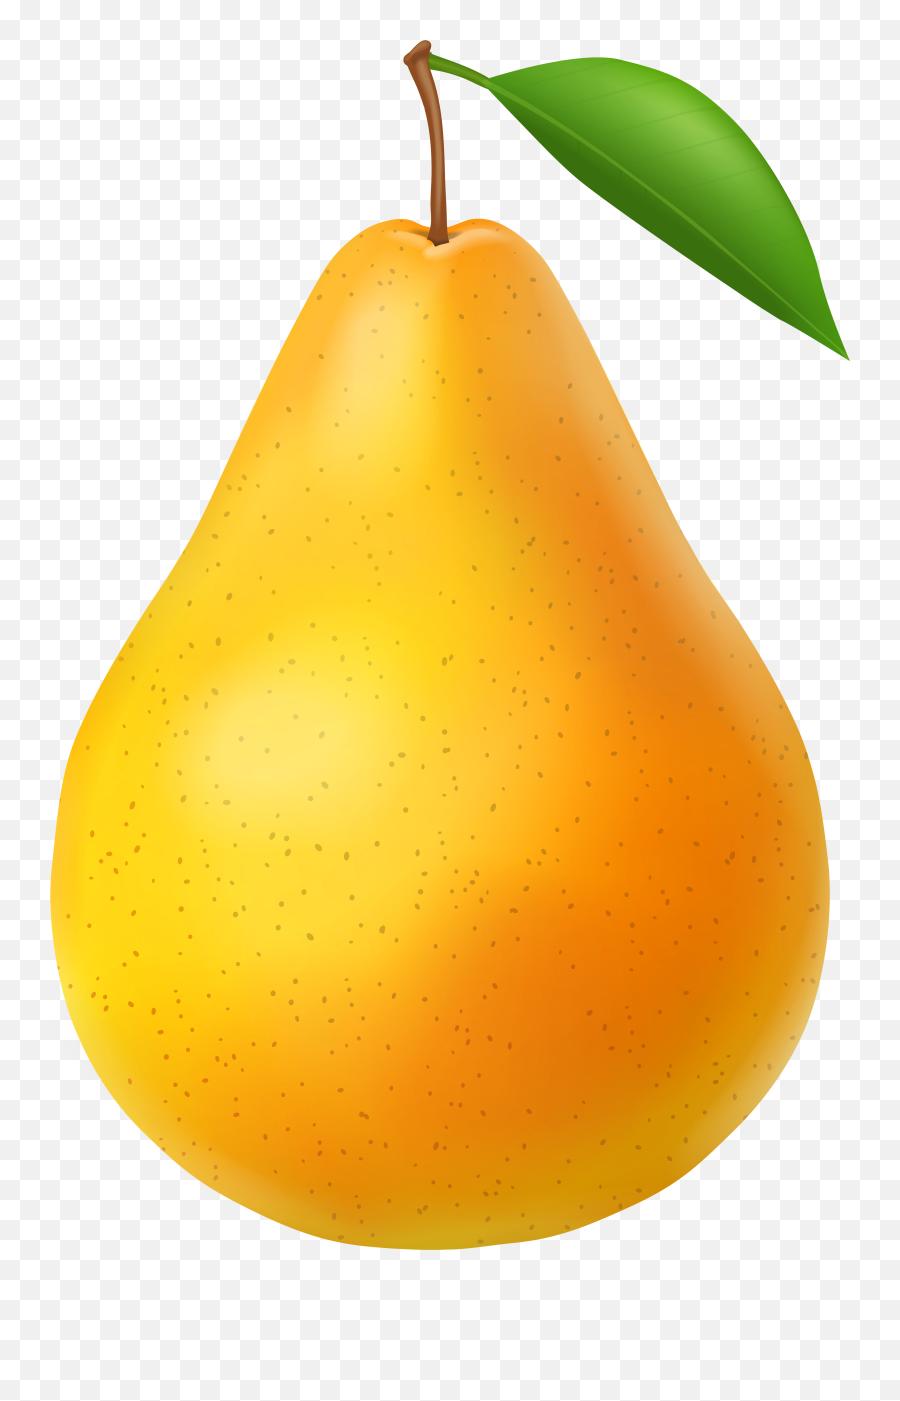 Pear Clip Art - Pear Png,Peas Png